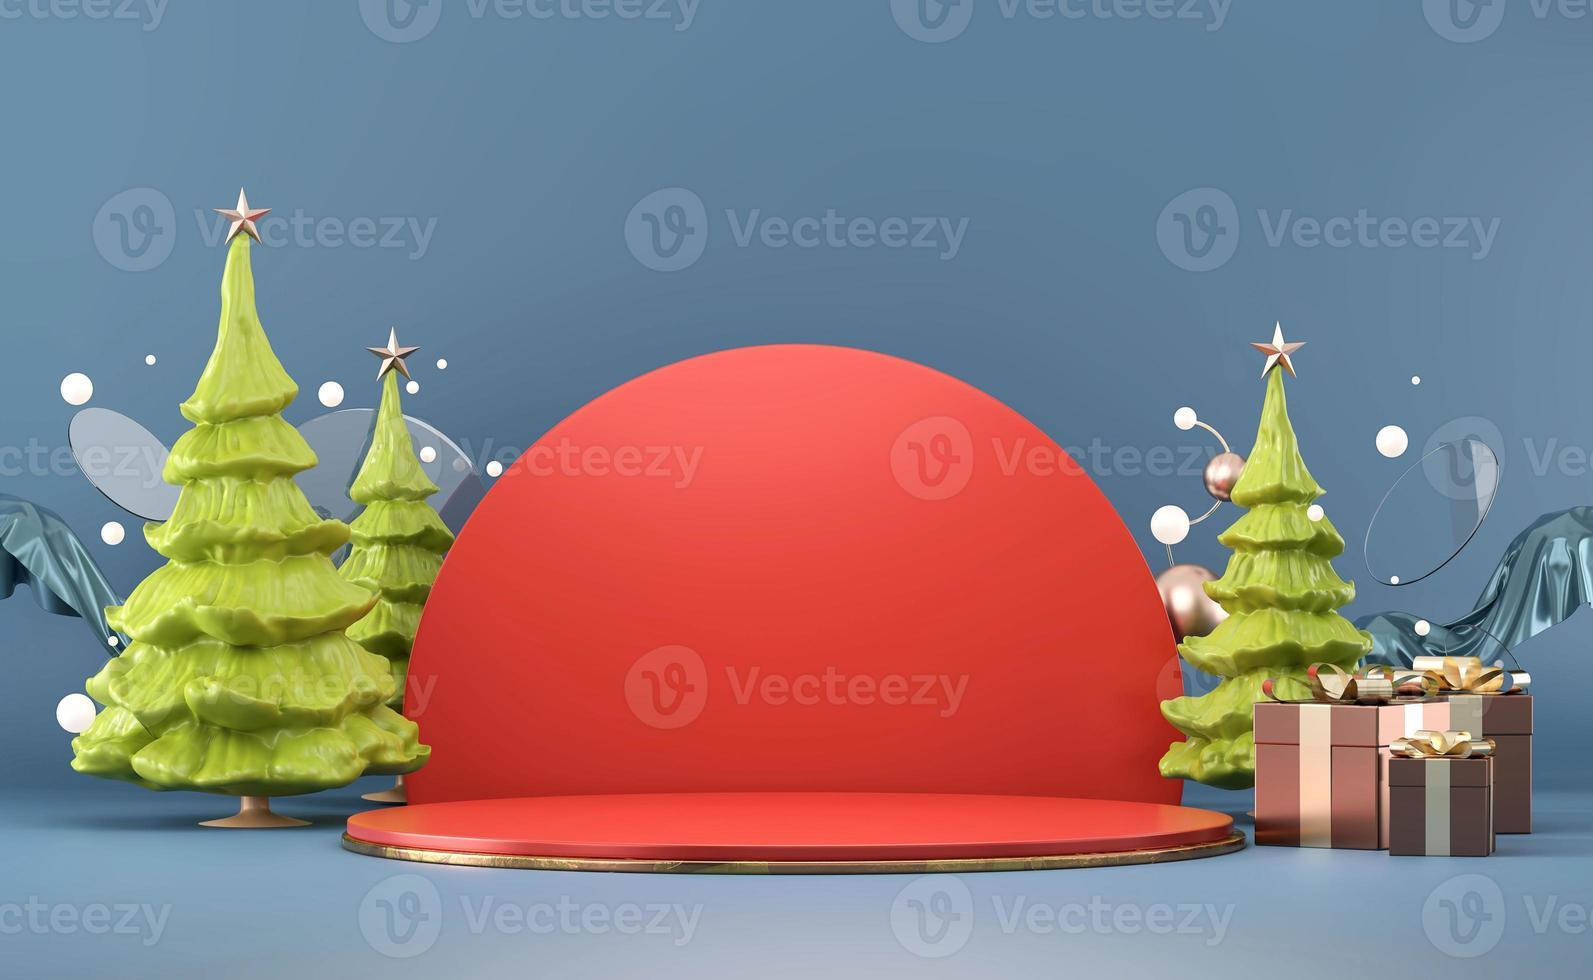 kerst abstract podium podium mockup foto